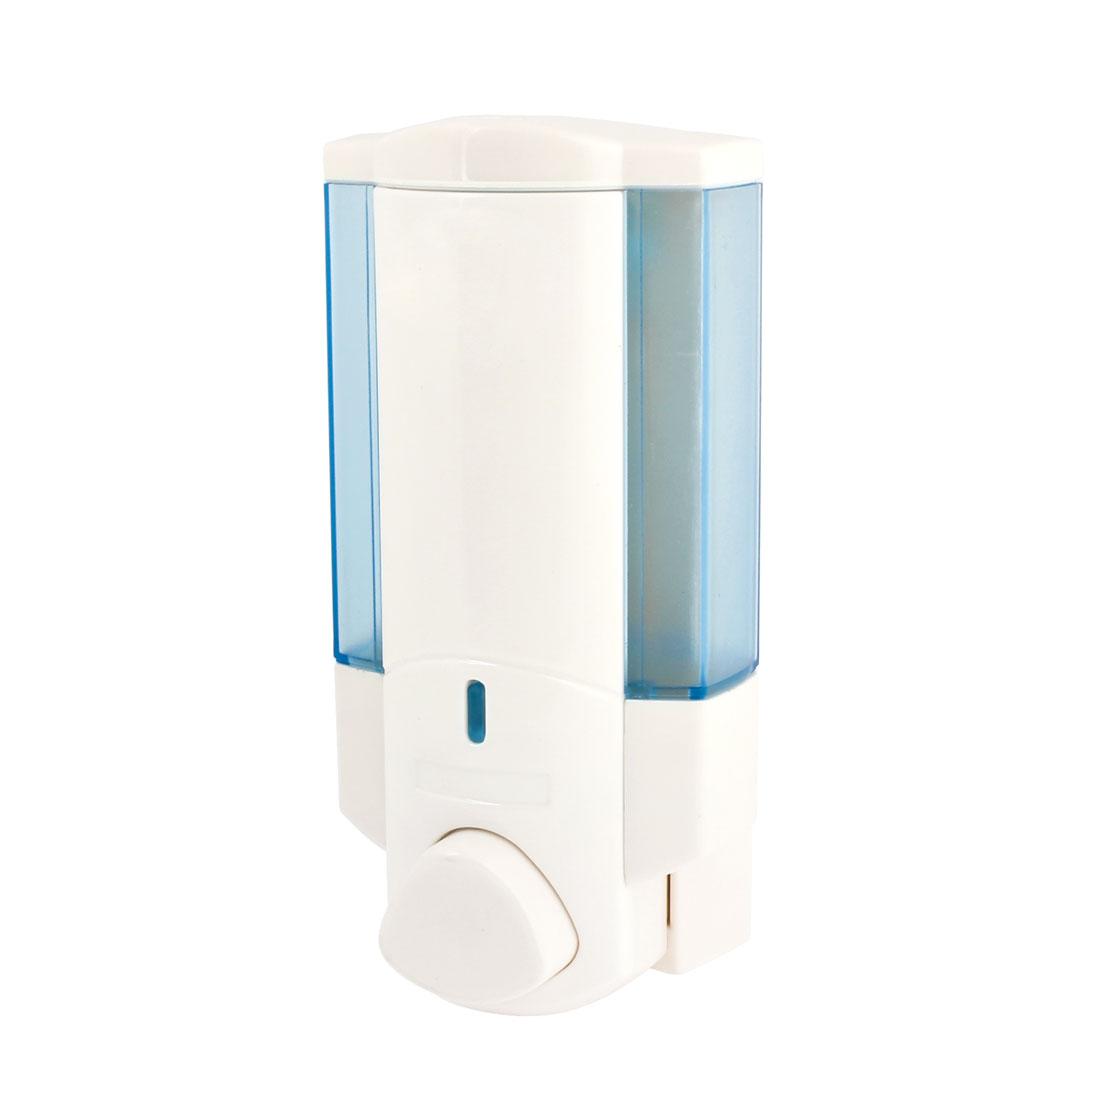 Home Bathroom 400ml Capacity Plastic Liquid Soap Lotion Pump Dispenser